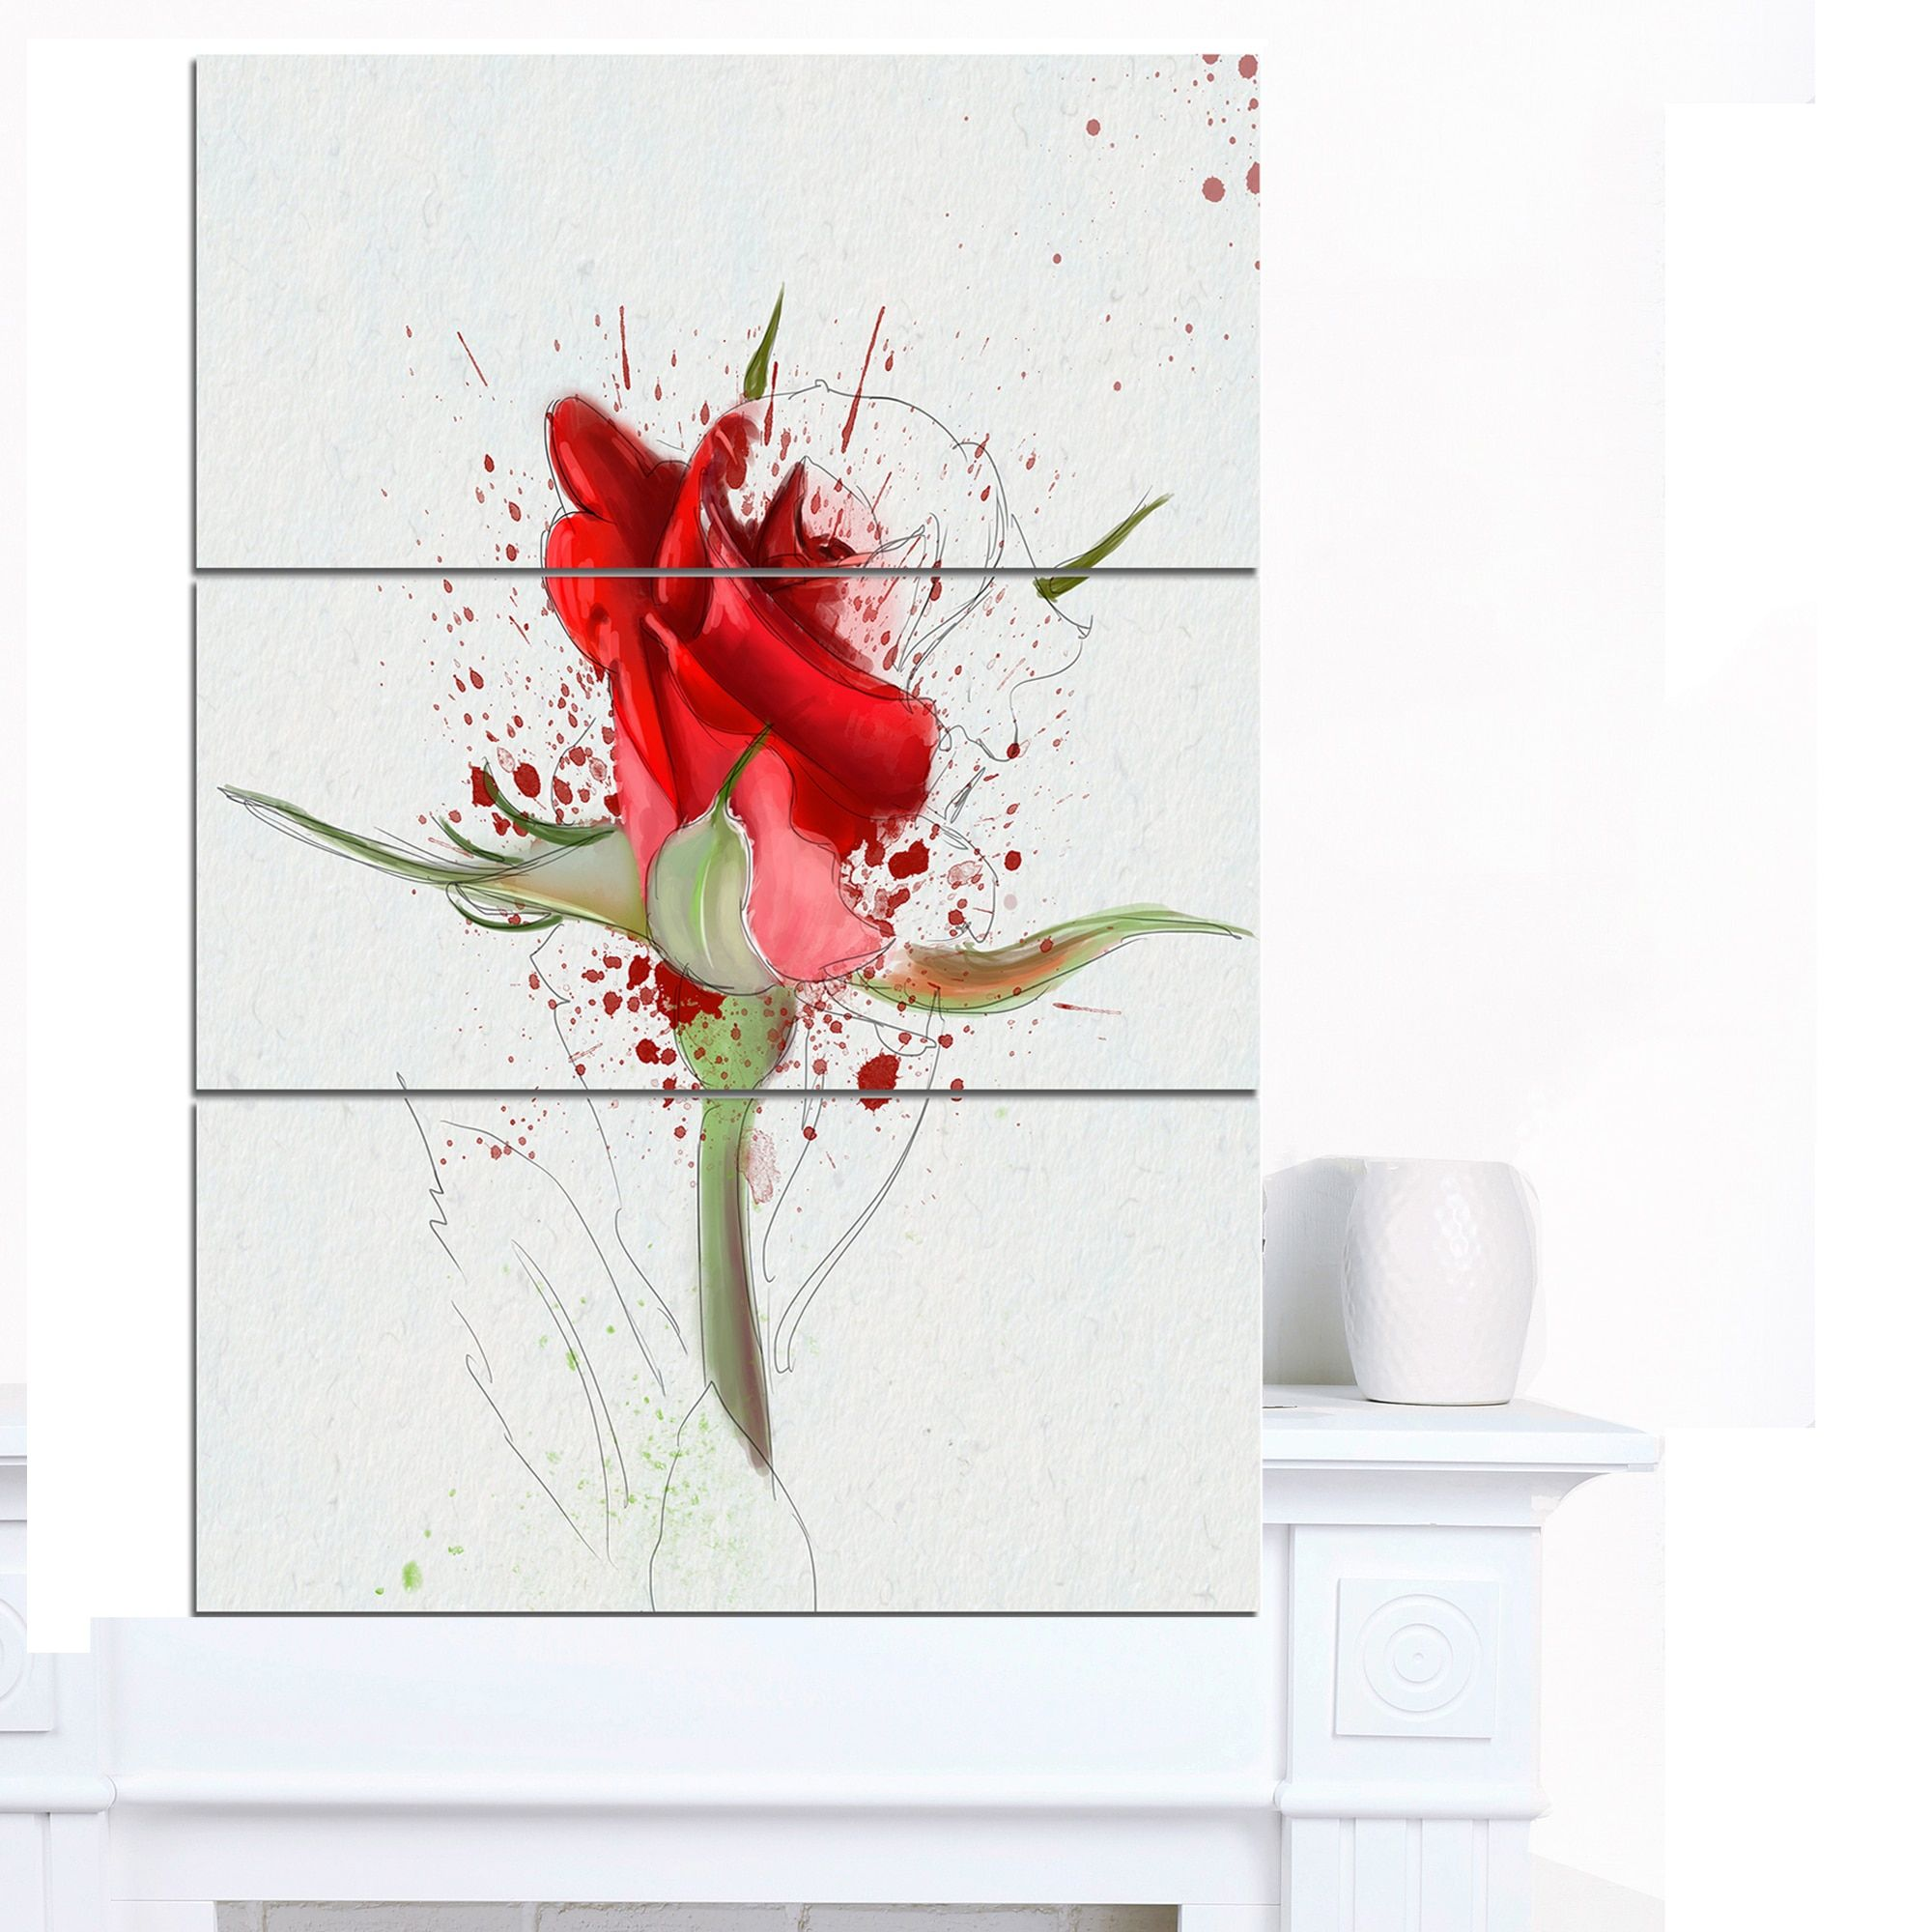 Drawn red rose art Rose by Designart Art Wall